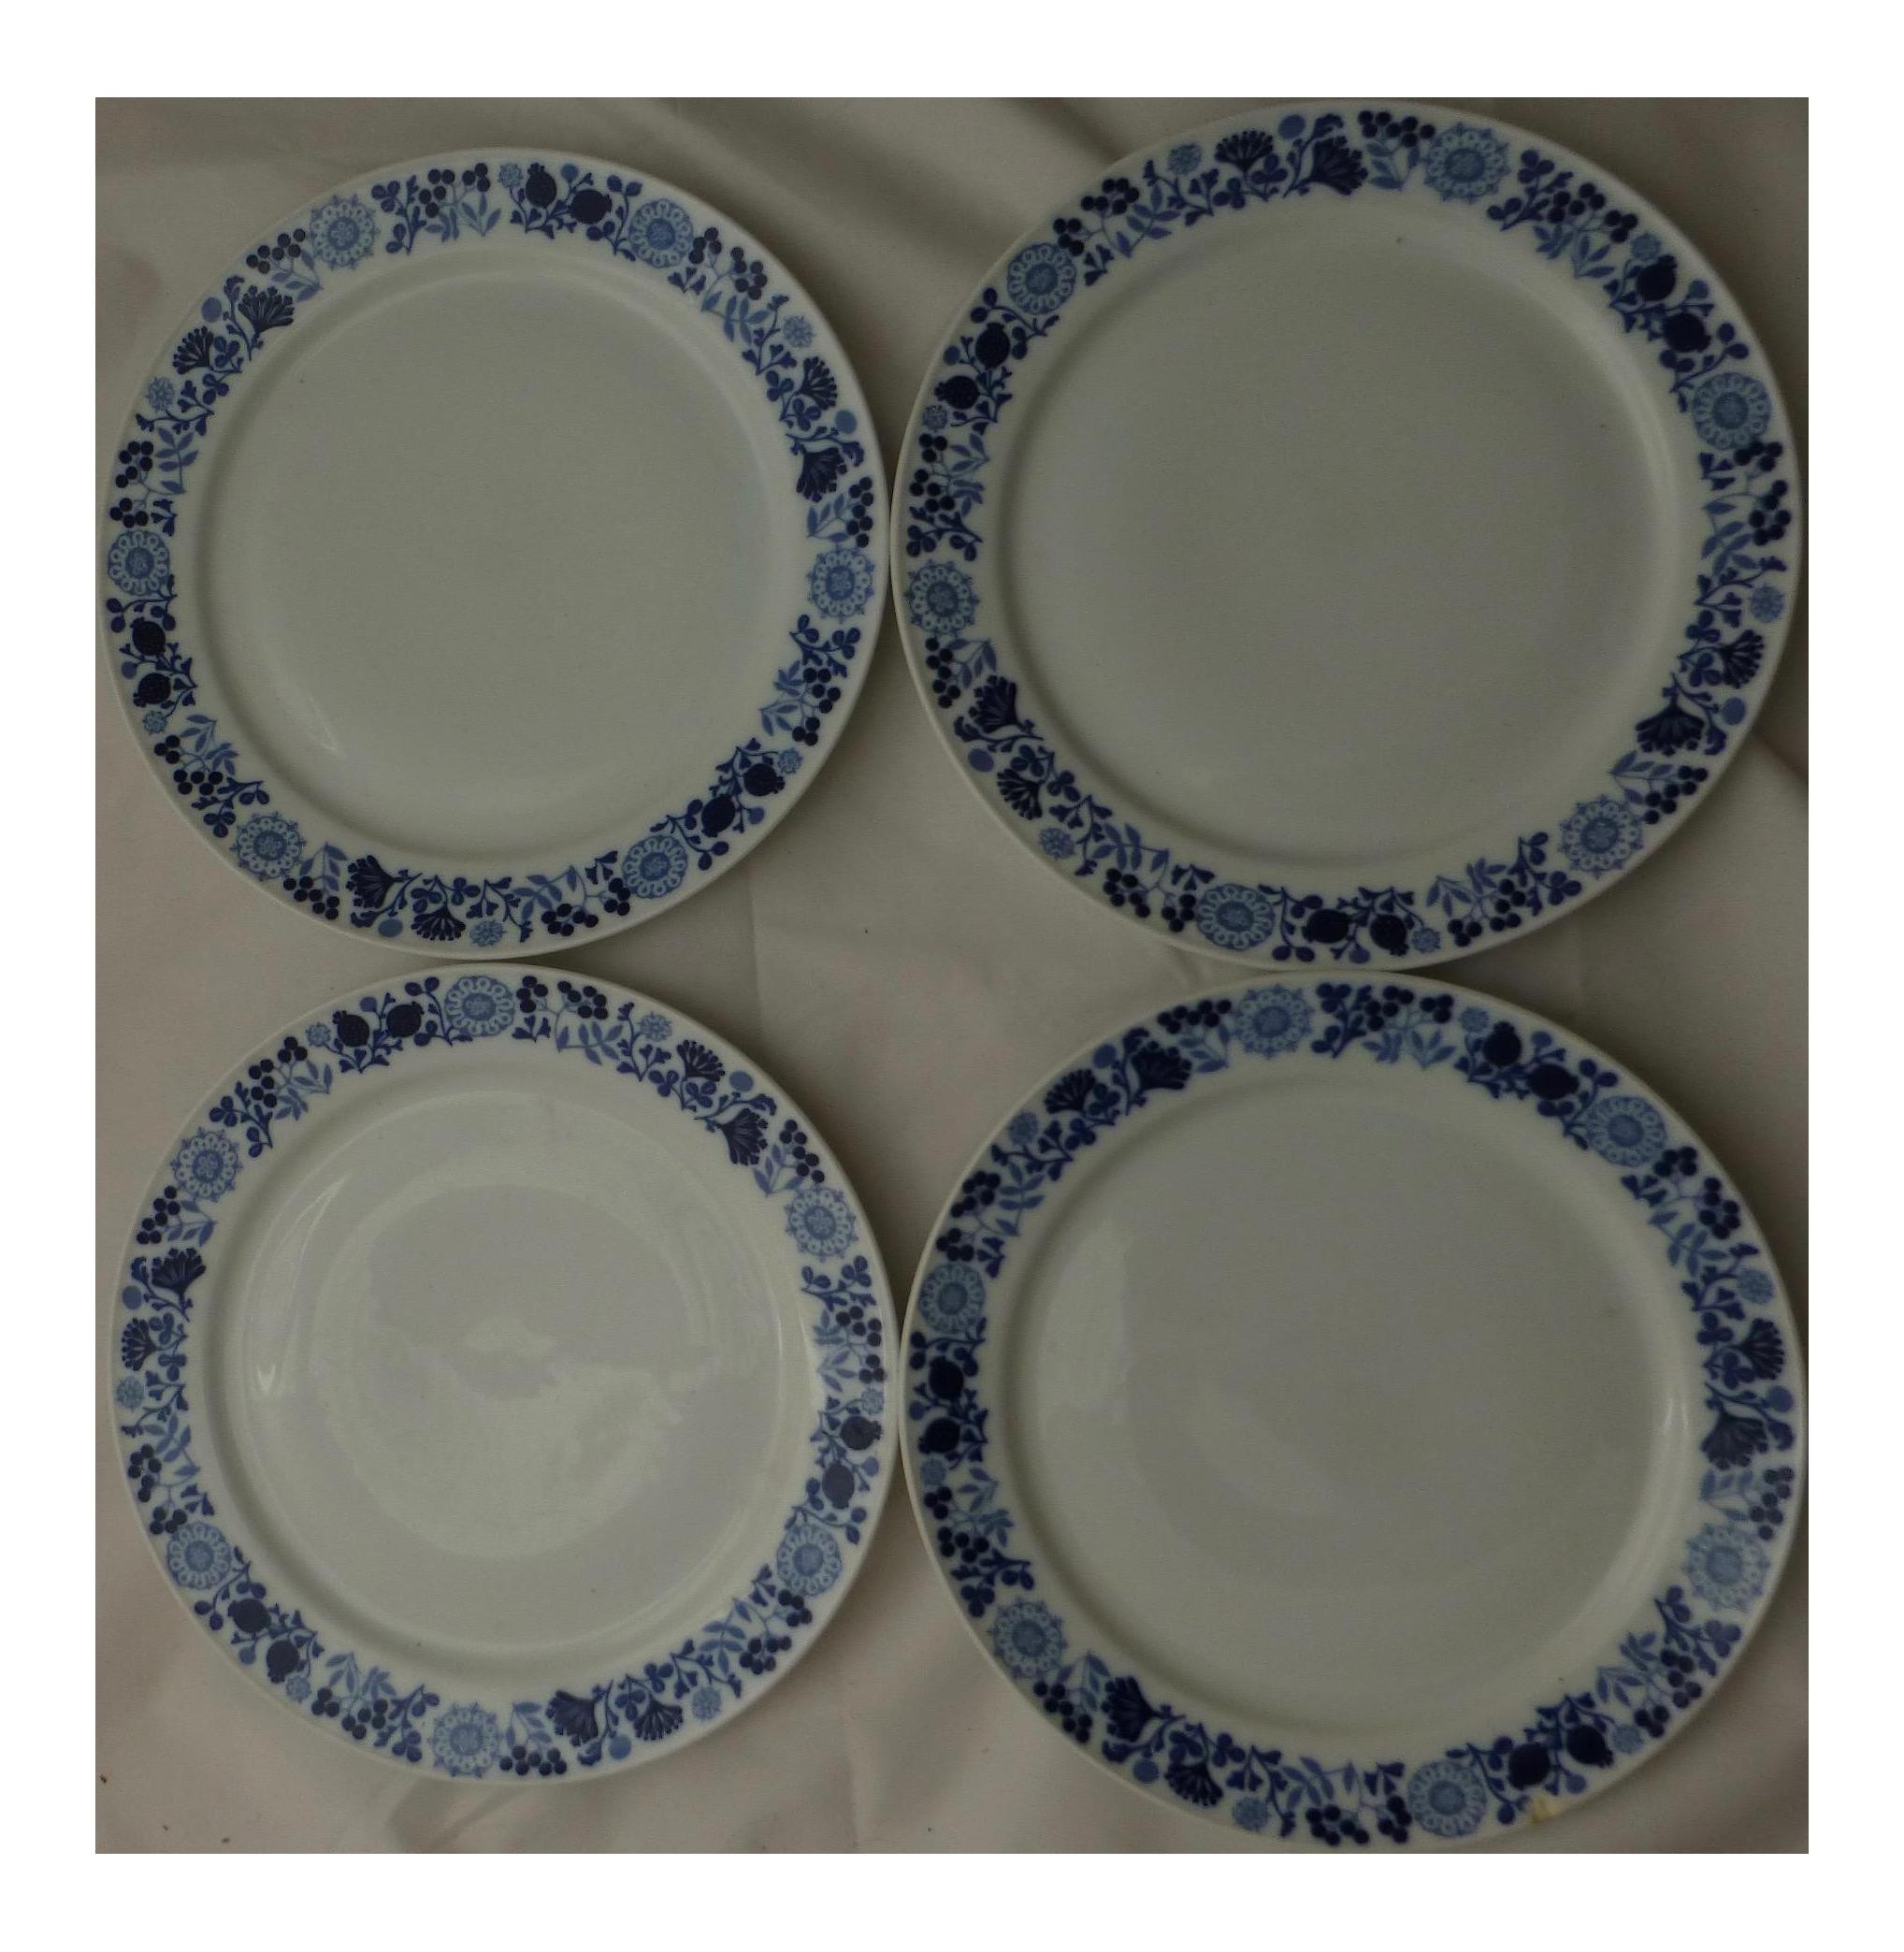 Melitta German Snowberry Dinner Plates - Set of 4 - Image 1 of 6  sc 1 st  Chairish & Melitta German Snowberry Dinner Plates - Set of 4 | Chairish